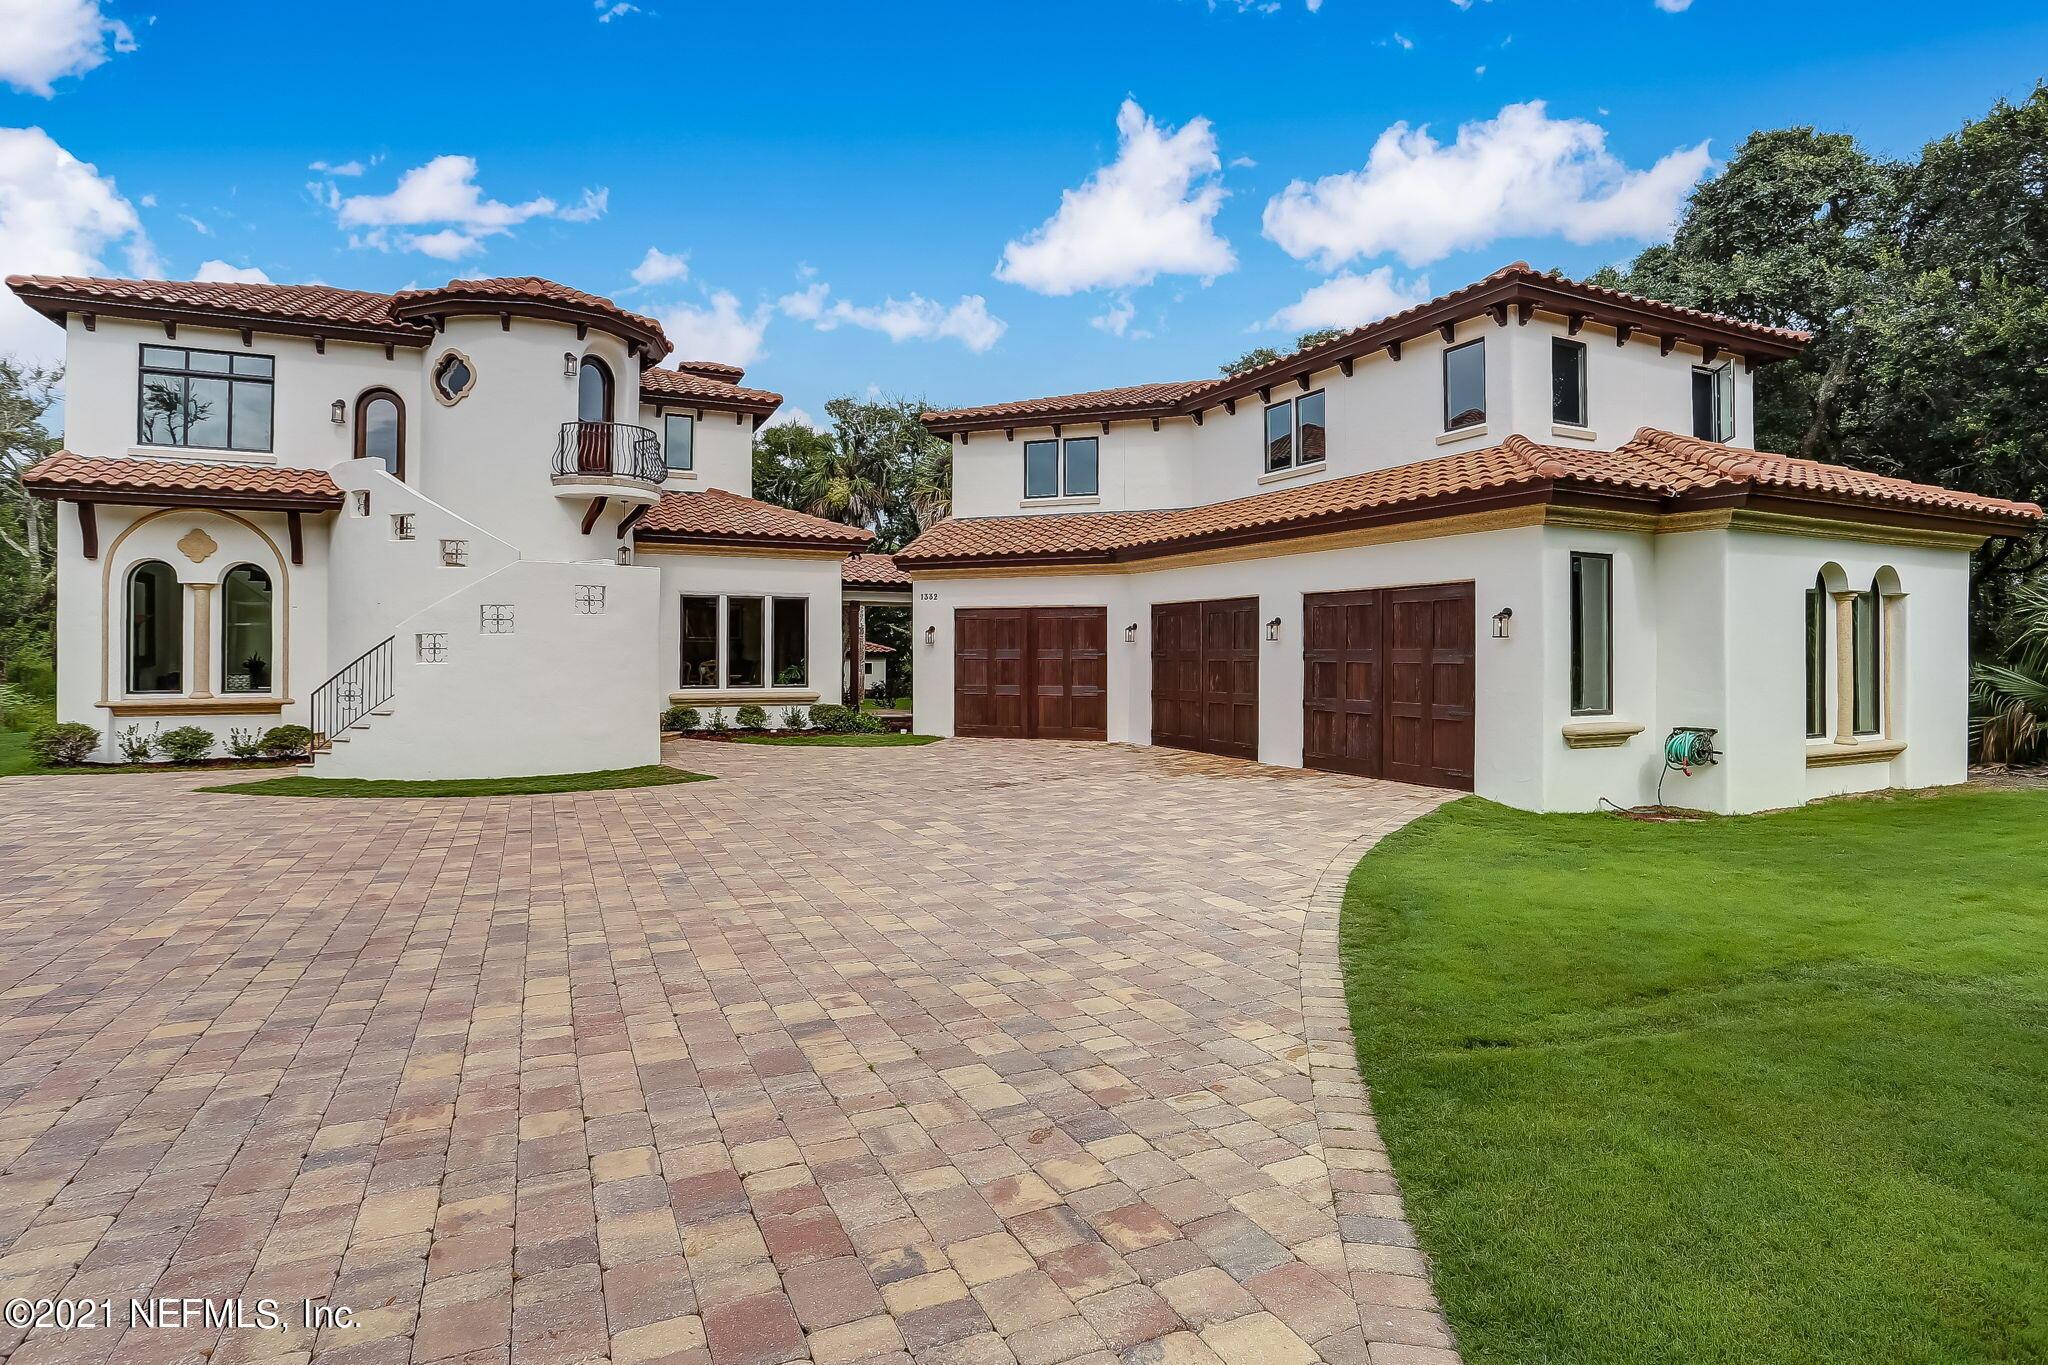 1332 PONTE VEDRA, PONTE VEDRA BEACH, FLORIDA 32082, 4 Bedrooms Bedrooms, ,3 BathroomsBathrooms,Residential,For sale,PONTE VEDRA,1120005